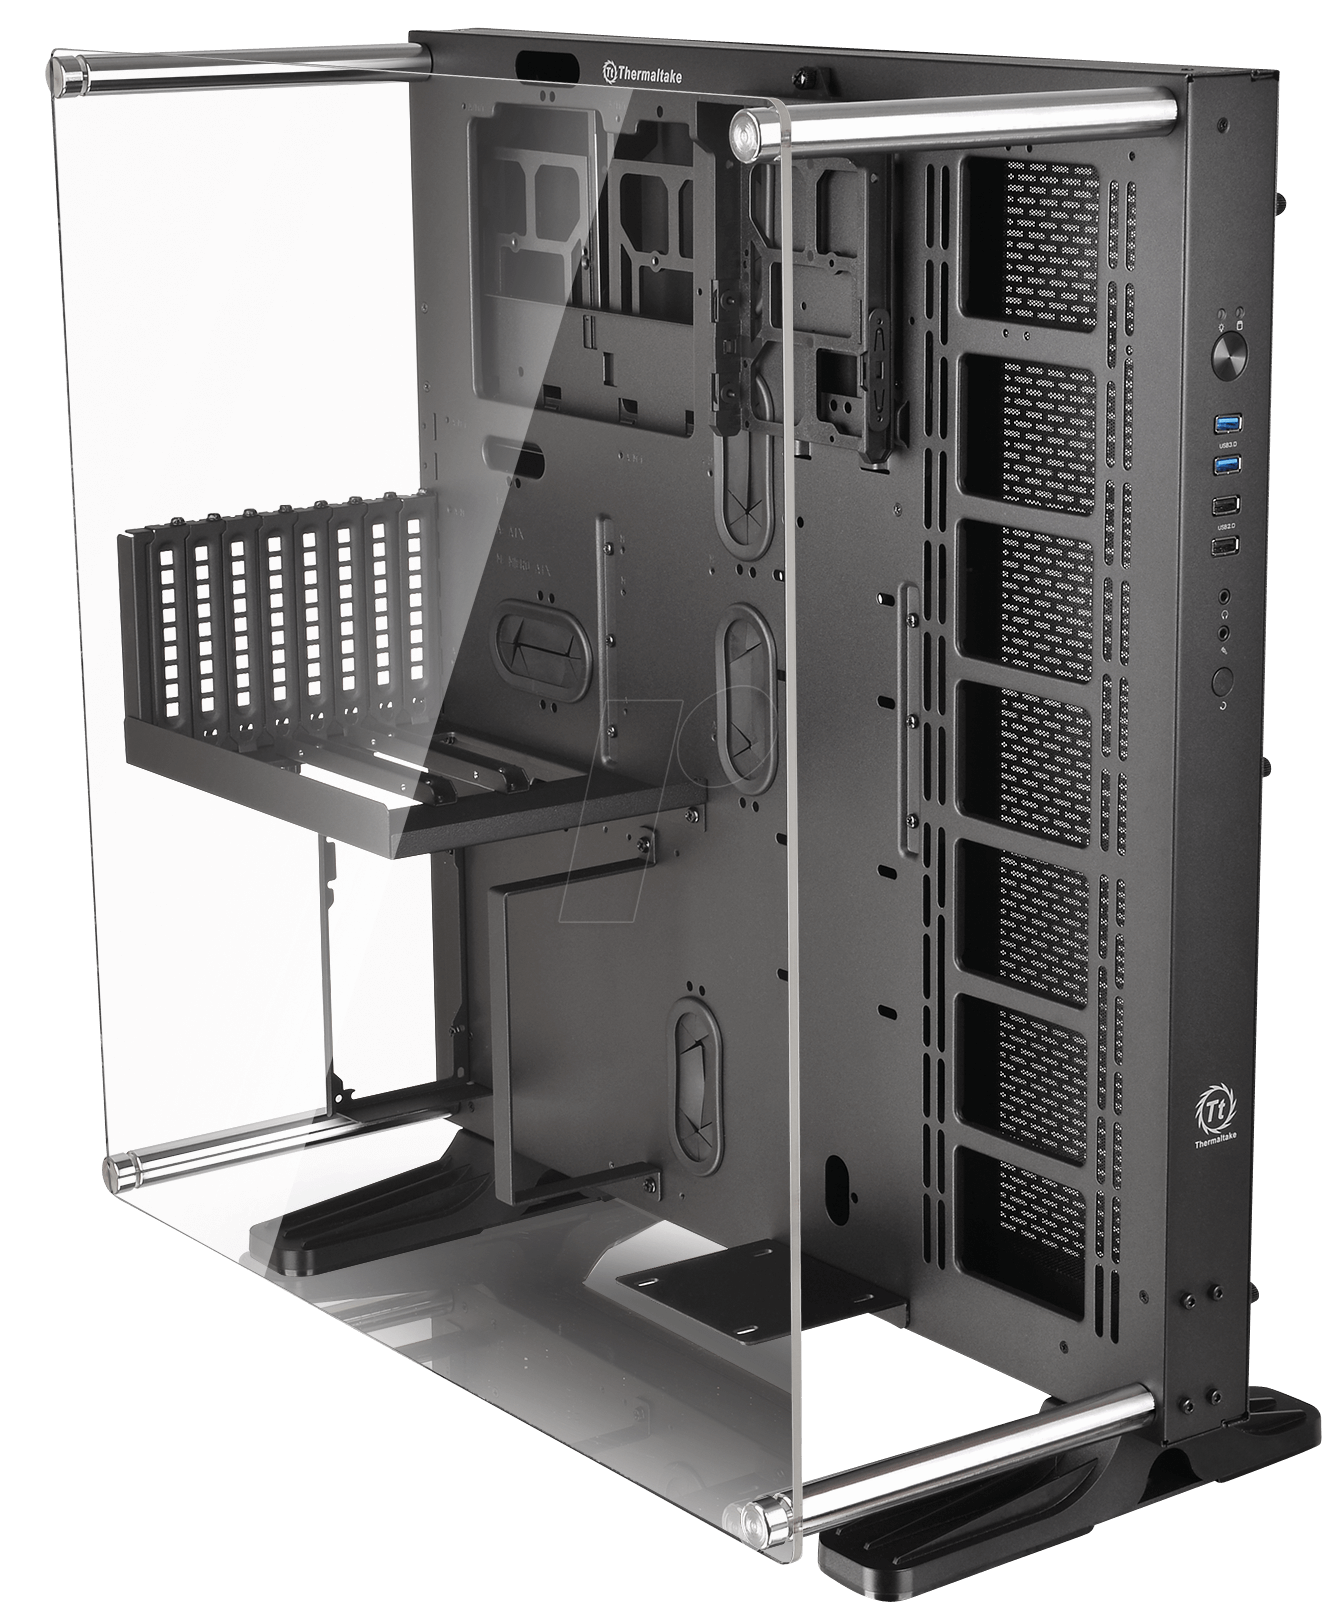 TT CORE P5 - Thermaltake ATX Maker Gehäuse Core P5